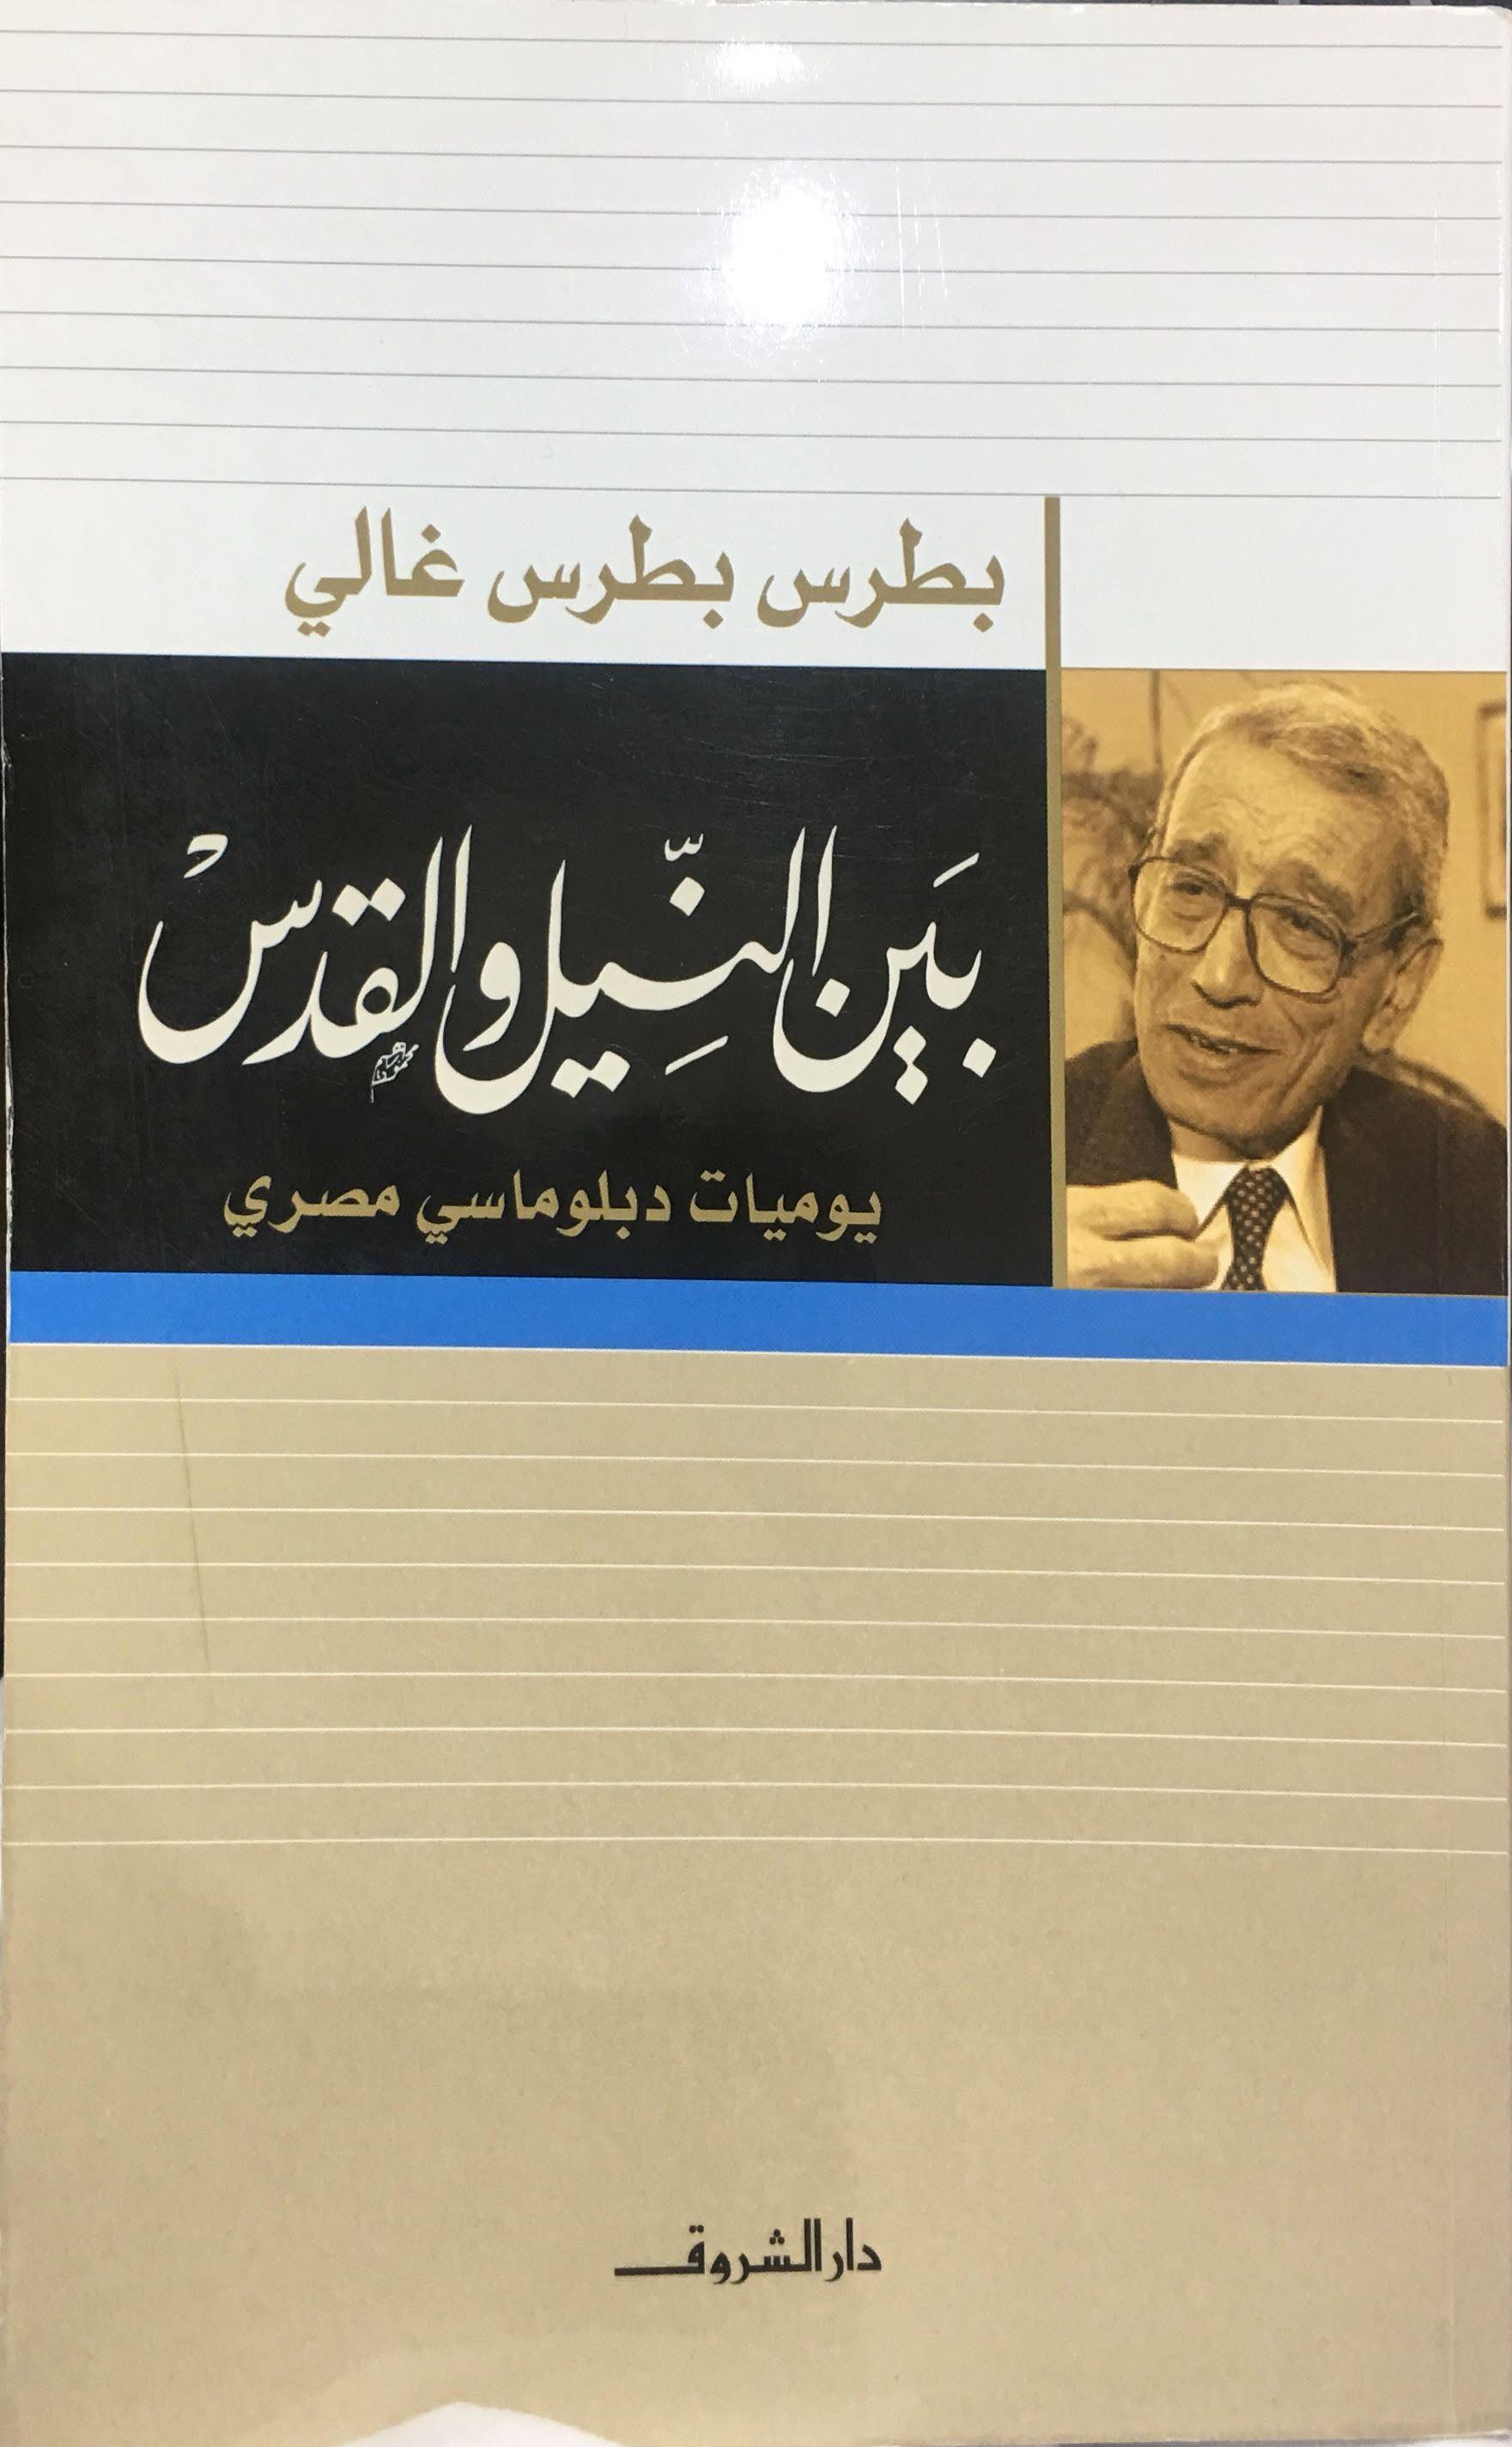 Pin by أحمد العساف on كتب Books Movie posters, Poster